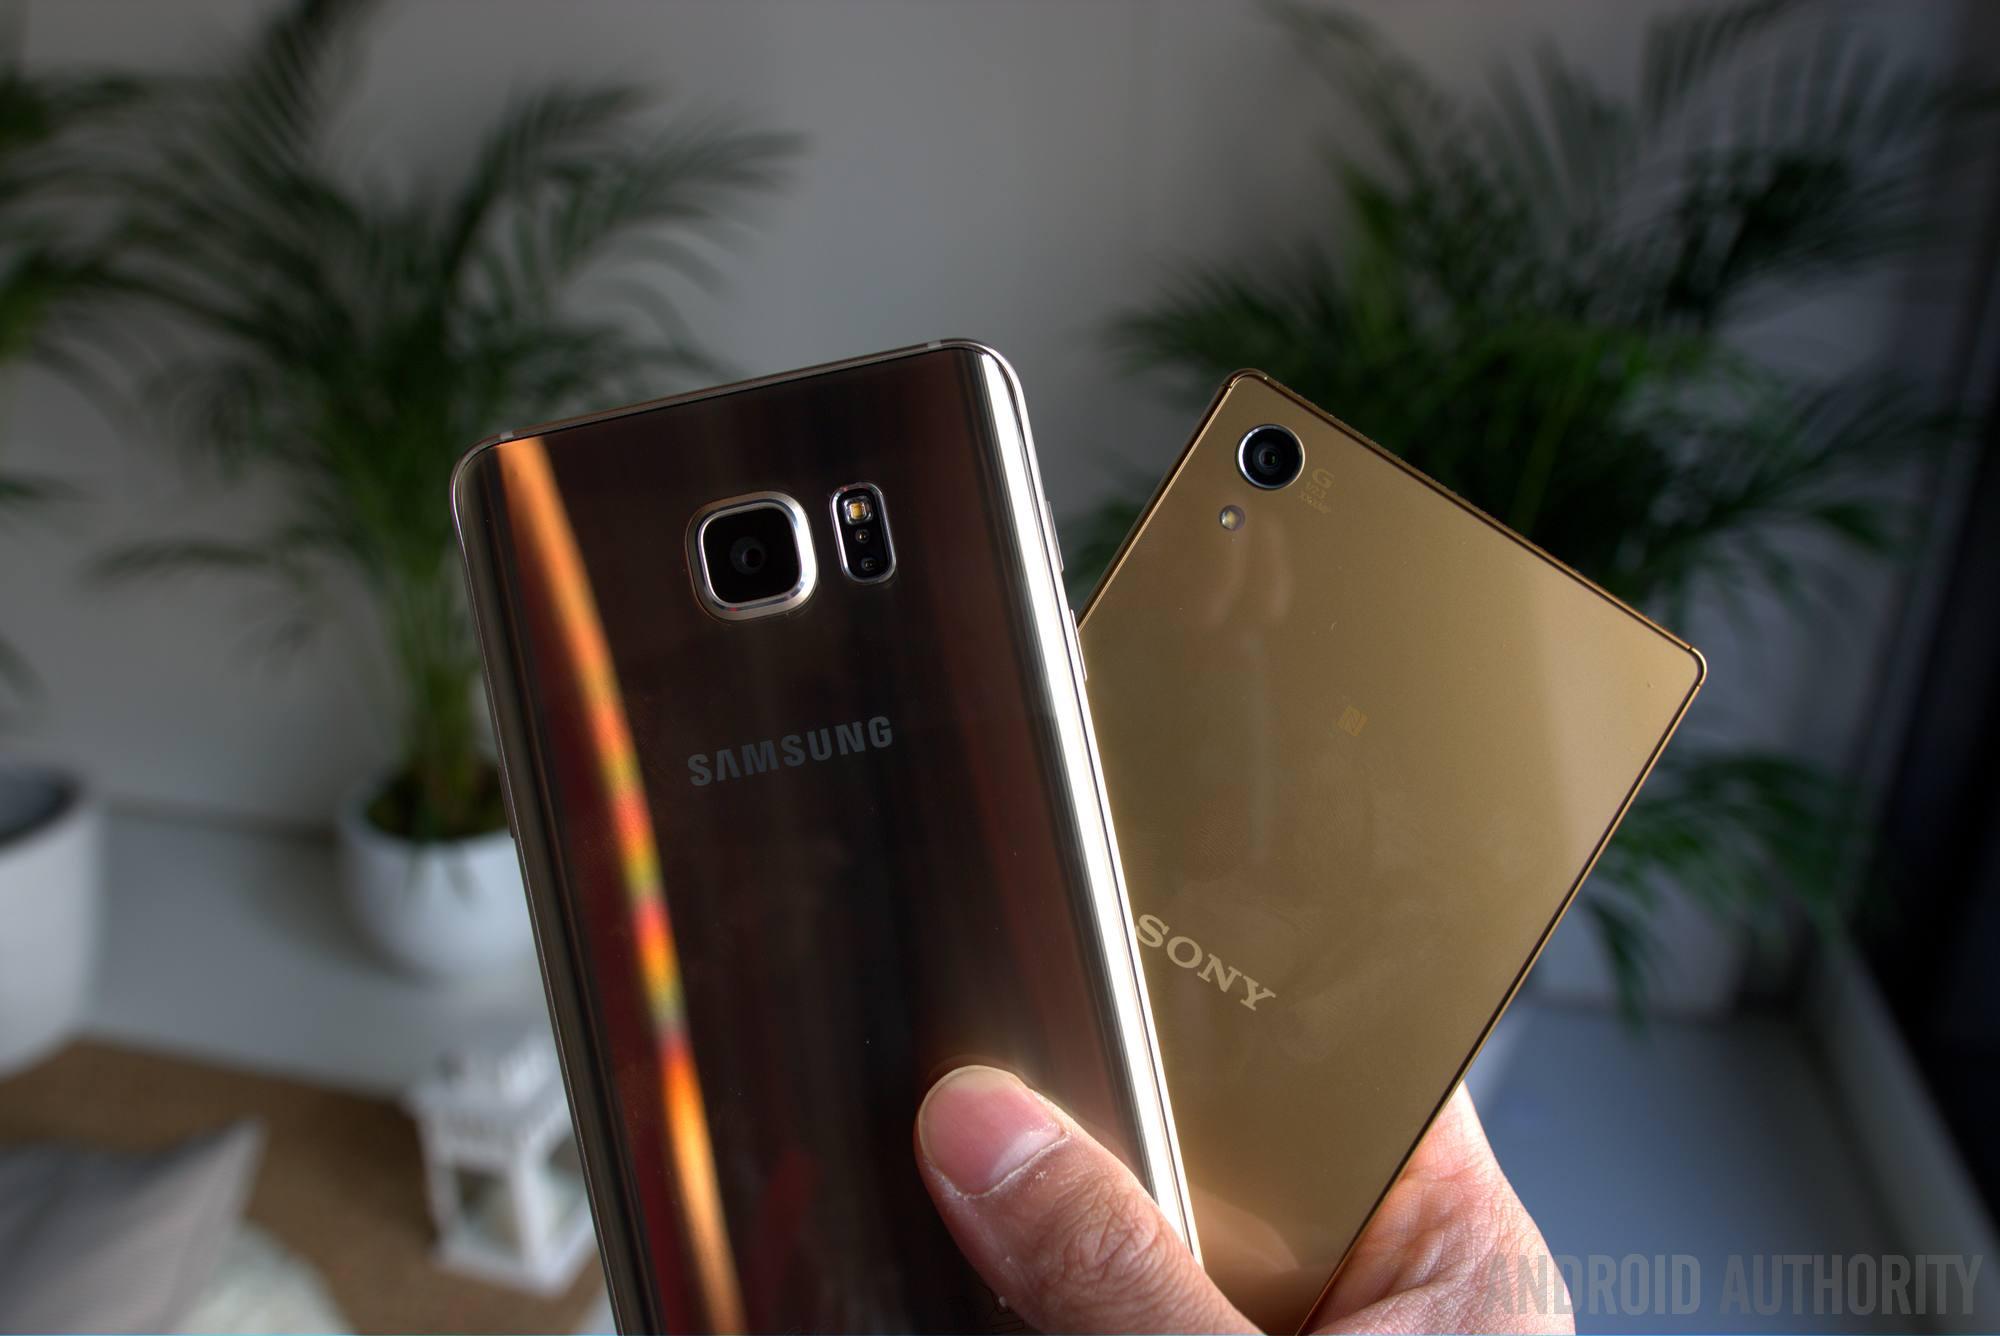 sony xperia z5 premium vs galaxy Note 5 aa 6